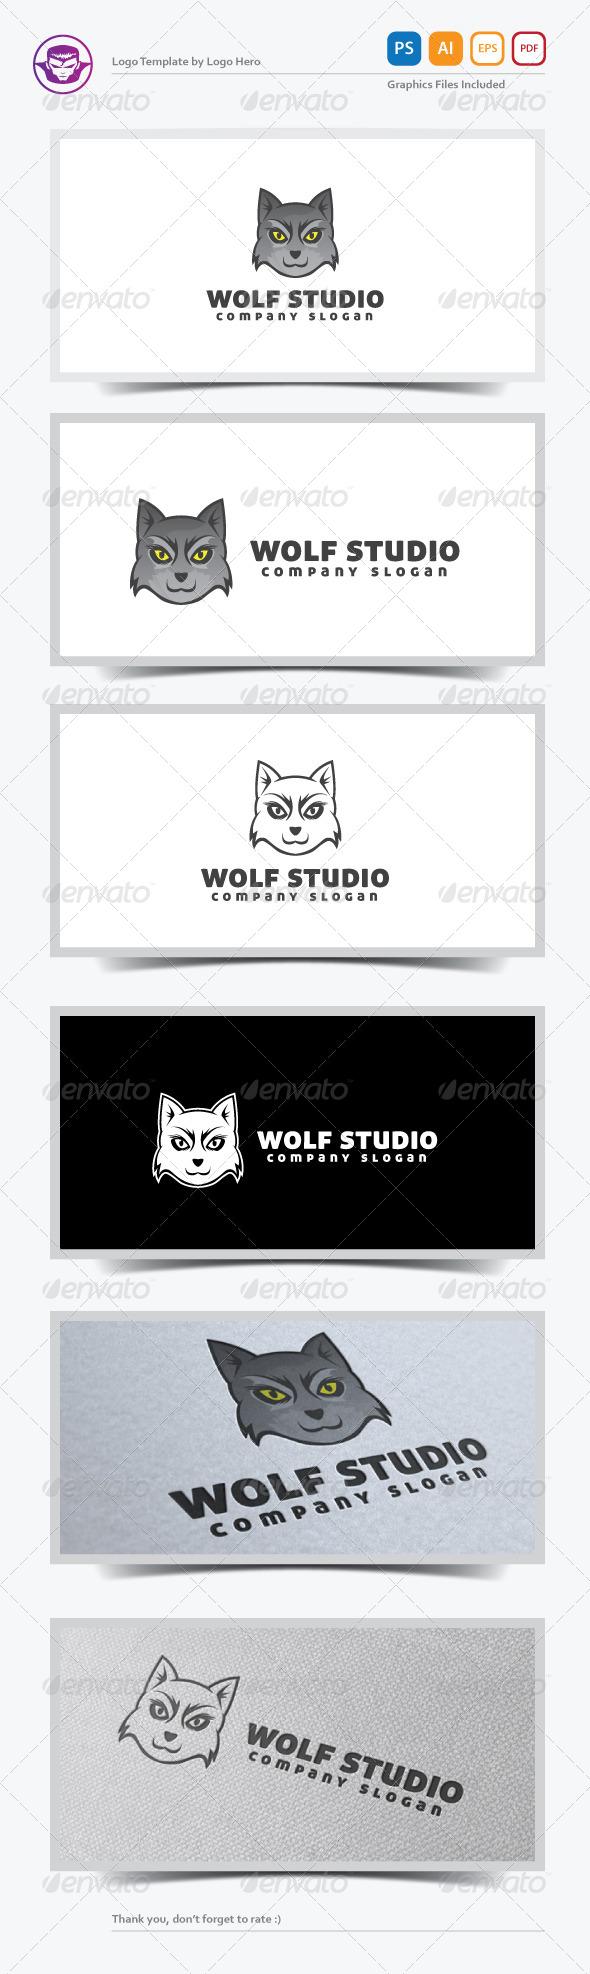 GraphicRiver Wolf Studio Logo Template 5471120